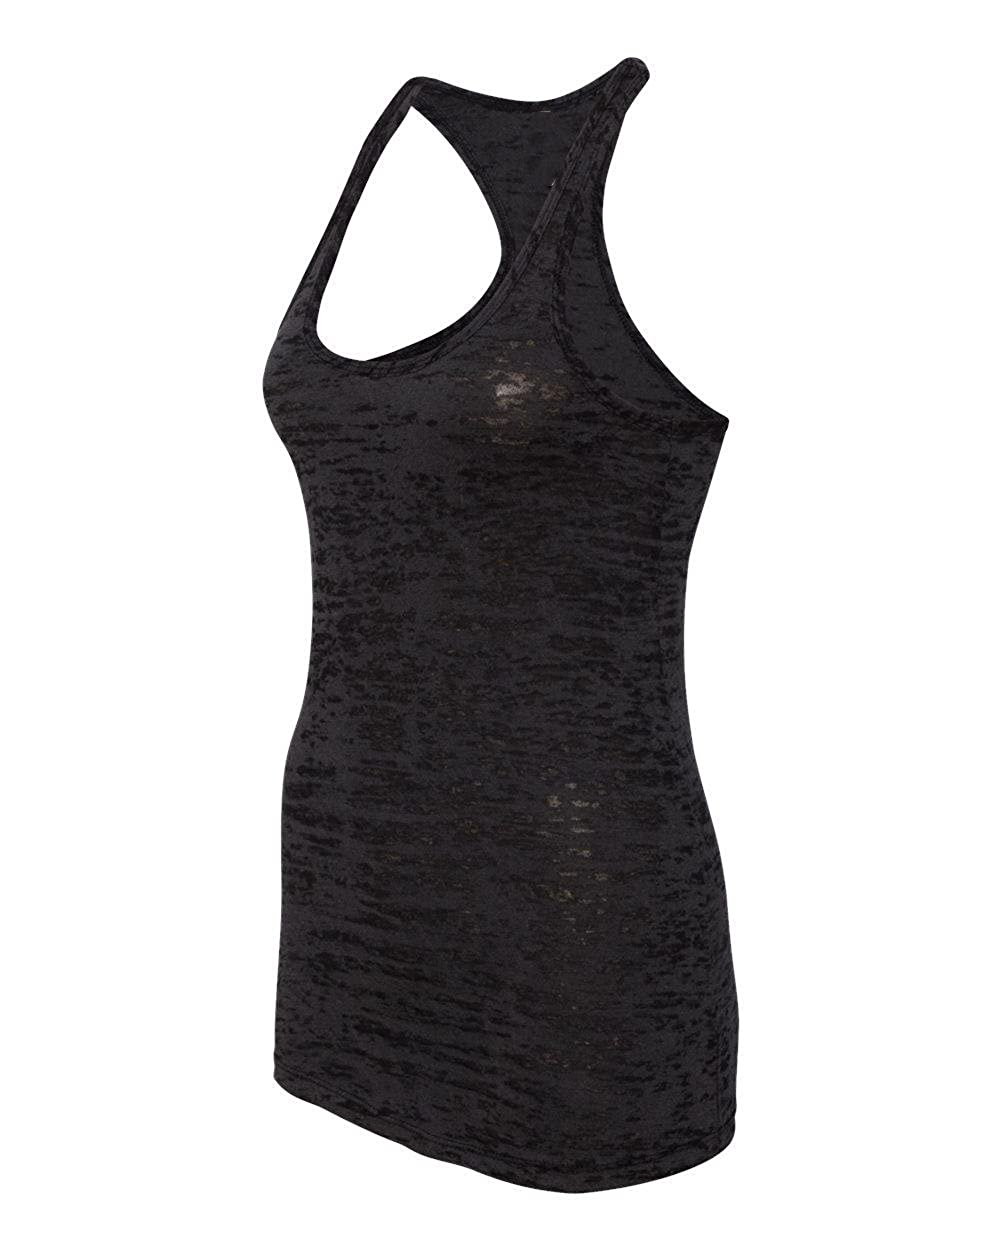 0080adb9f6c53 Amazon.com  Orange Arrow Womens Workout Tanks - No Regrets Just Results -  Zumba Tank Tops by Echona Apparel  Clothing